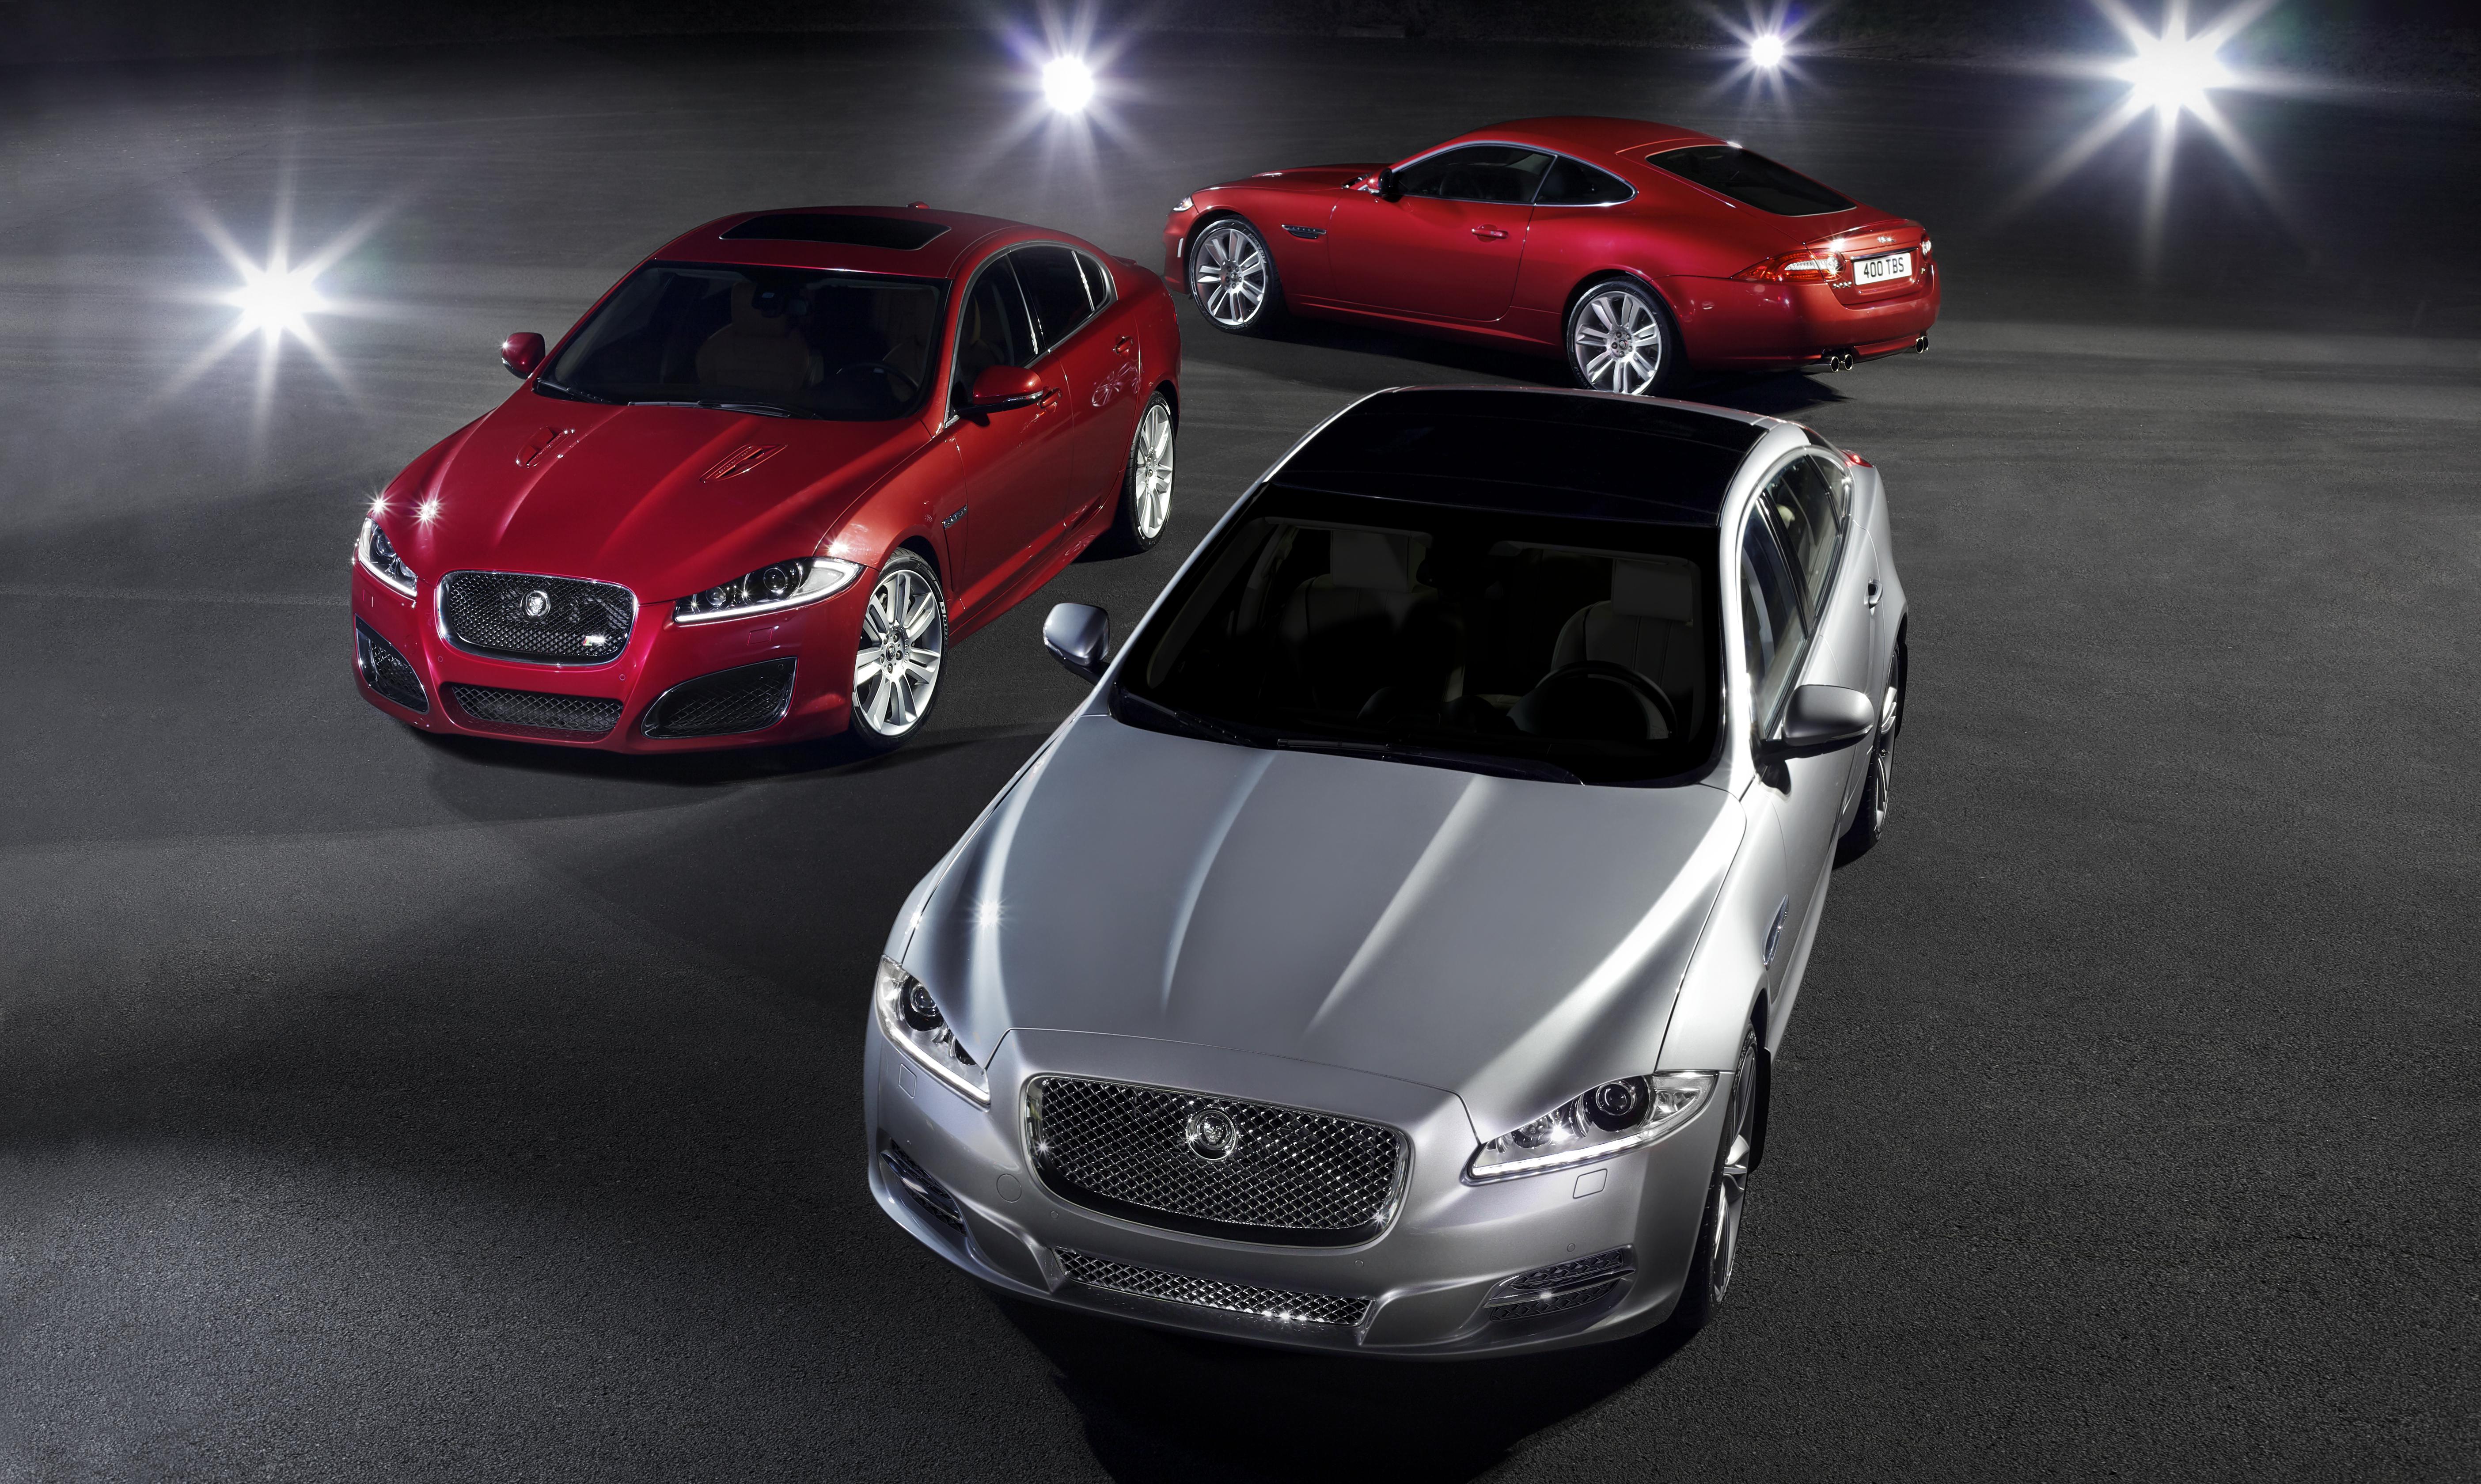 2012 Jaguar Model Range | Jaguar homepage International on